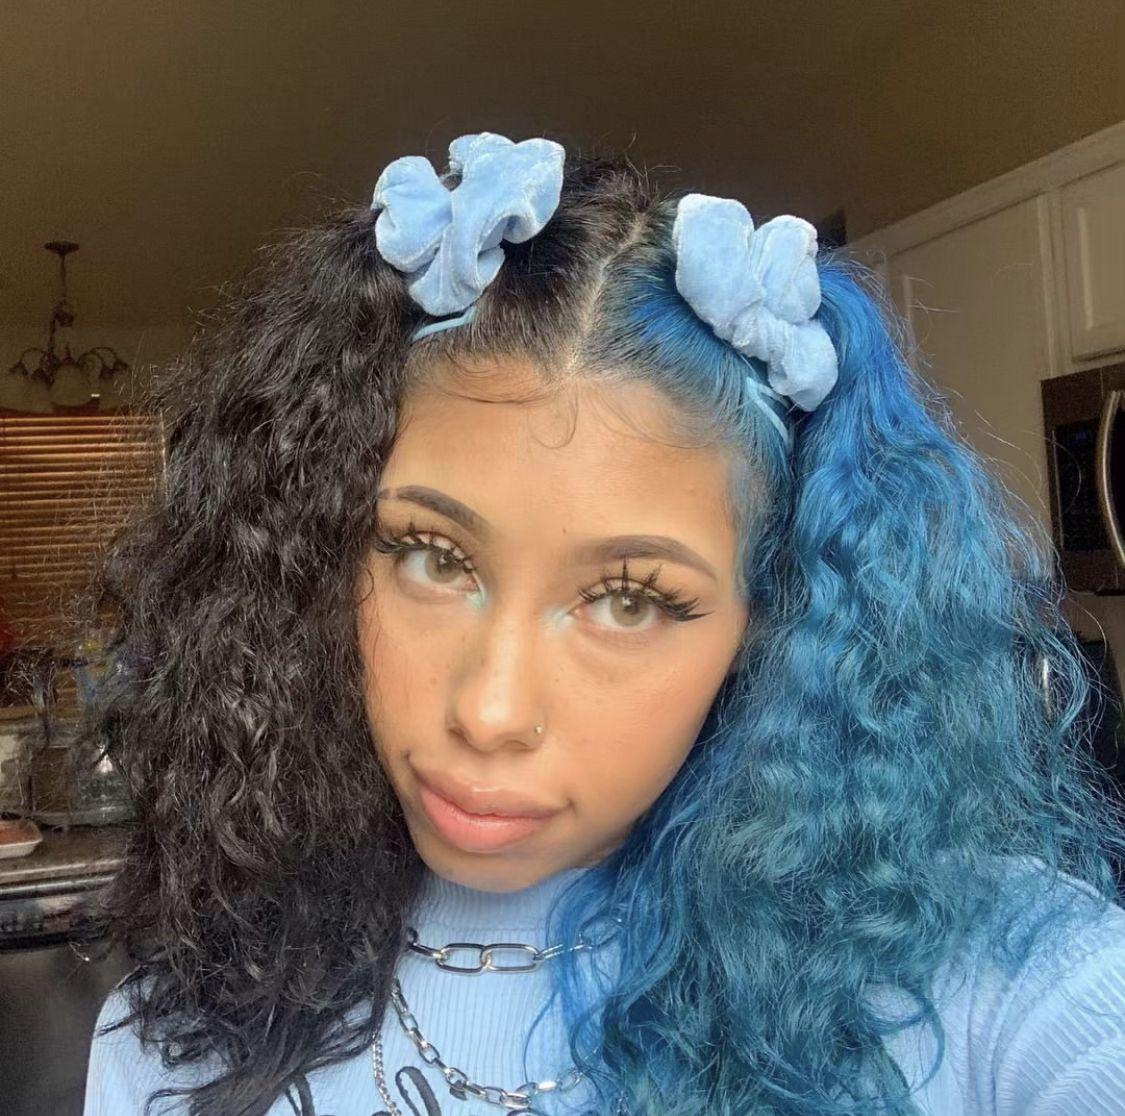 Split Hair Dye Half Black Half Blue In 2020 Split Dyed Hair Aesthetic Hair Dyed Hair